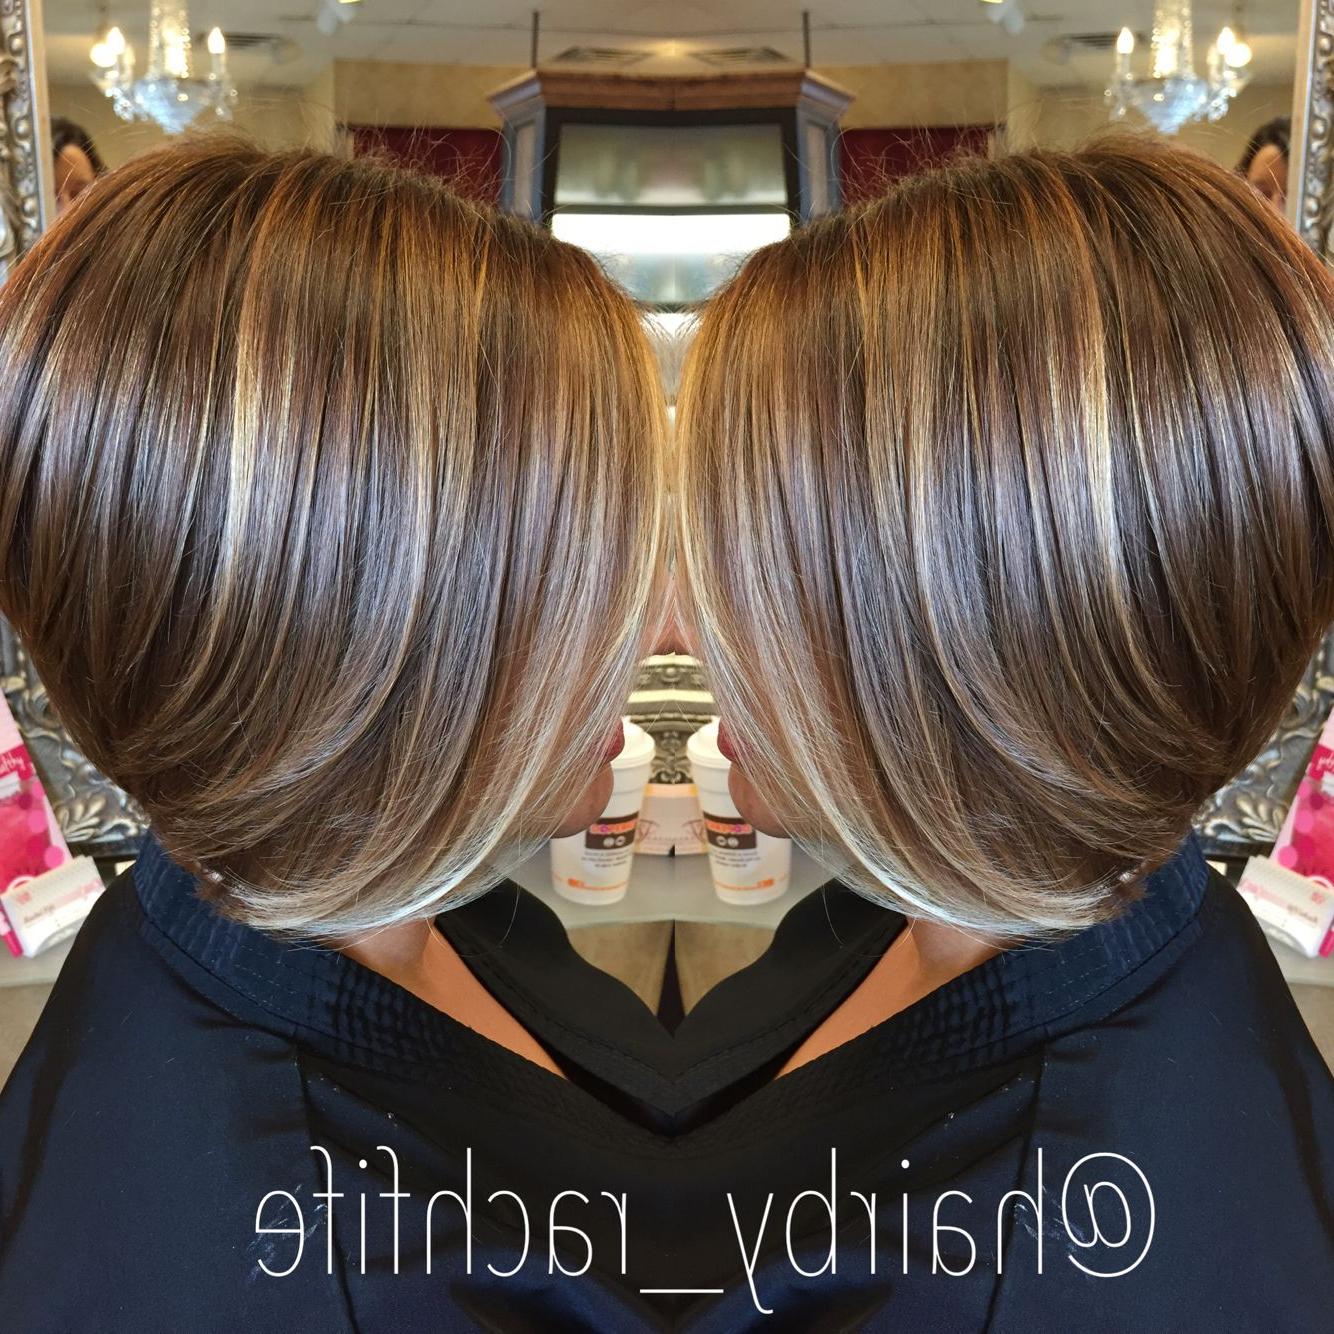 Short Bob Haircut With Subtle Balayage Highlights (View 16 of 20)